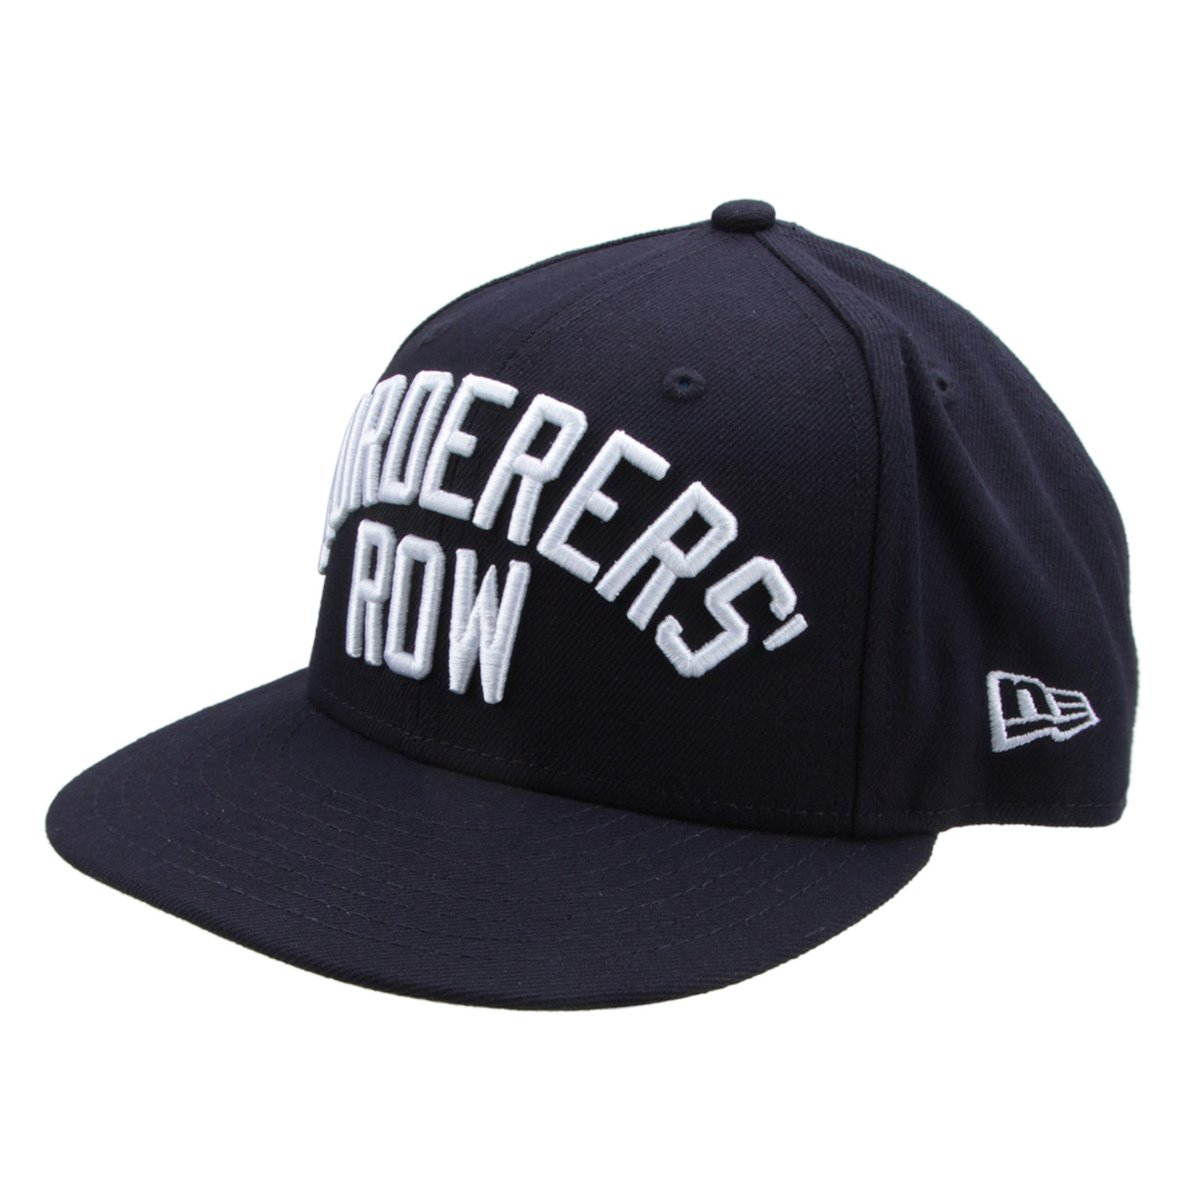 2f0eadb6c8206 Boné New Era MLB New York Yankees Aba Reta 950 Of Sn Team Cal 34 ...